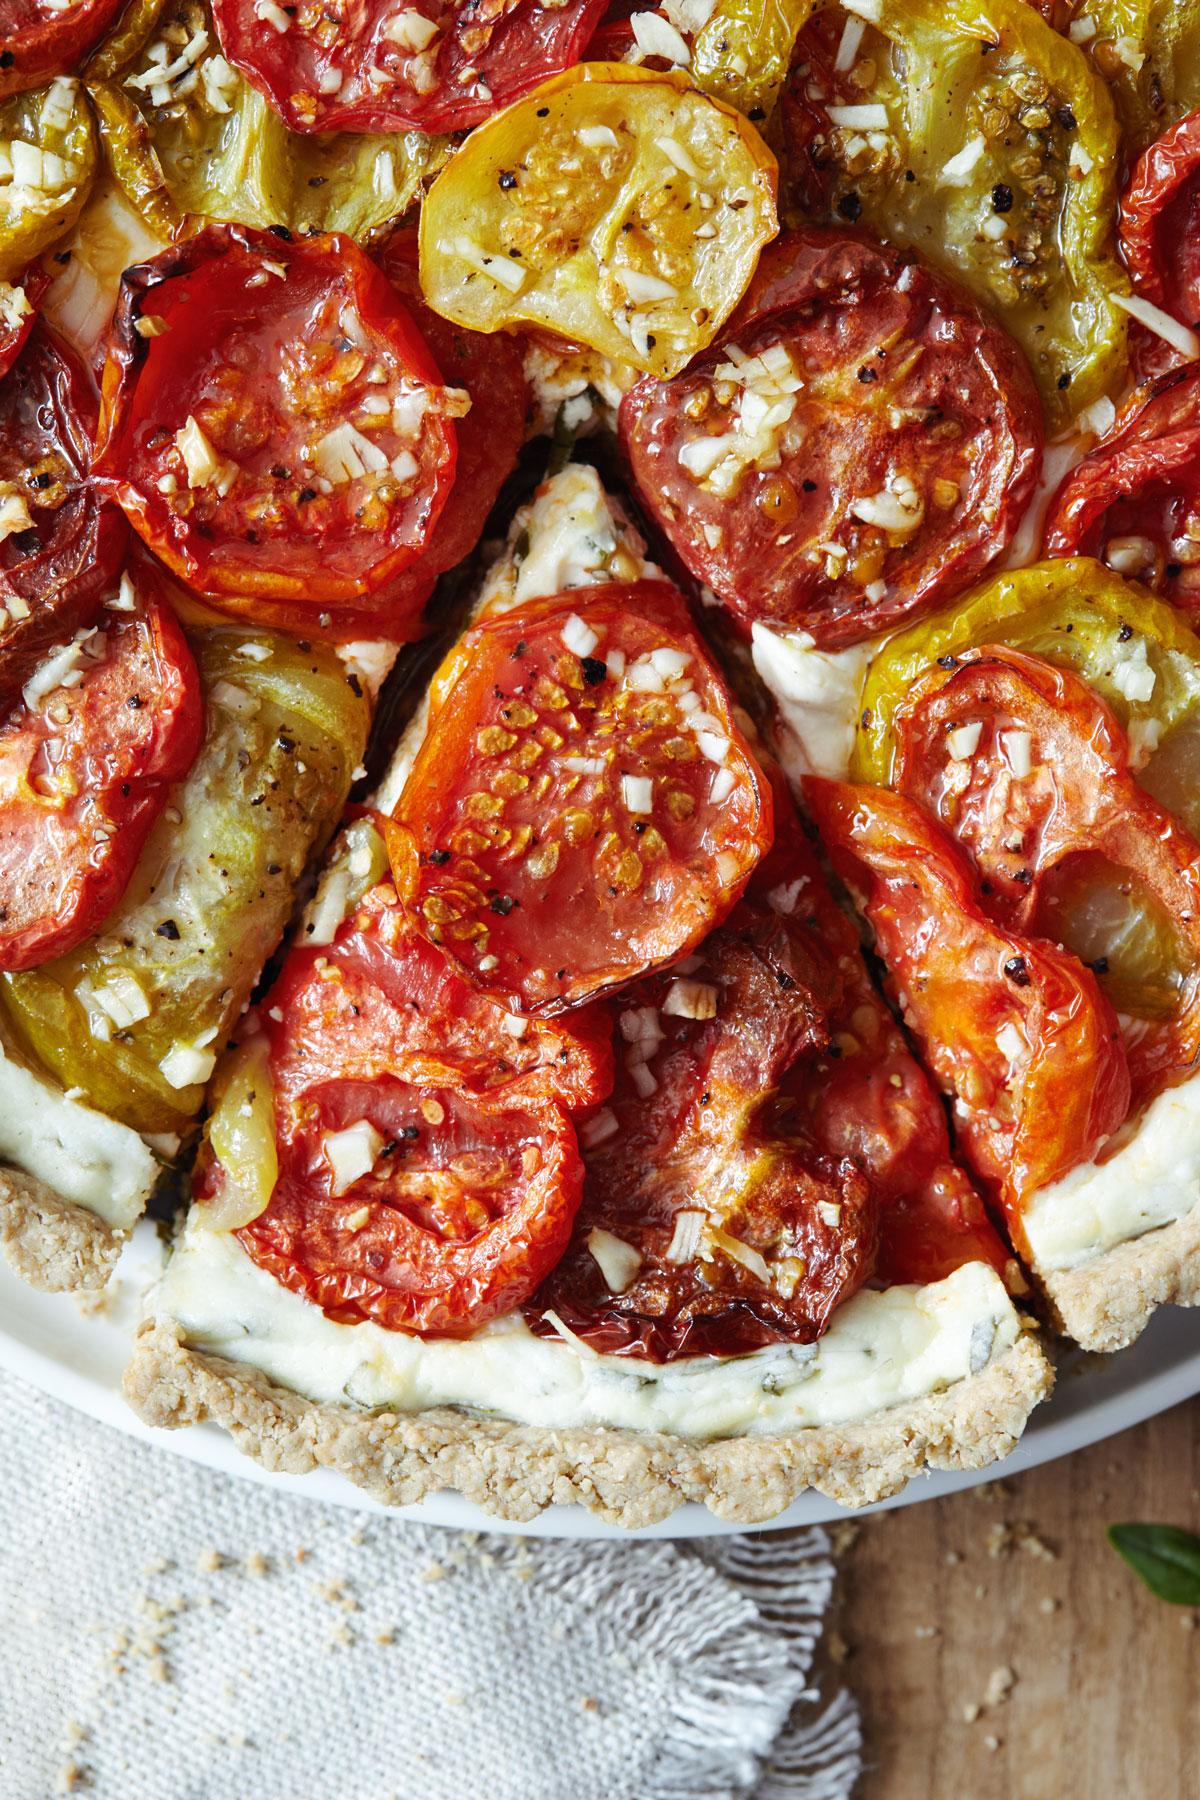 Heirloom Tomato Tart with Gluten Free Crust // Natural Girl Modern World// Vegetarian & Gluten Free